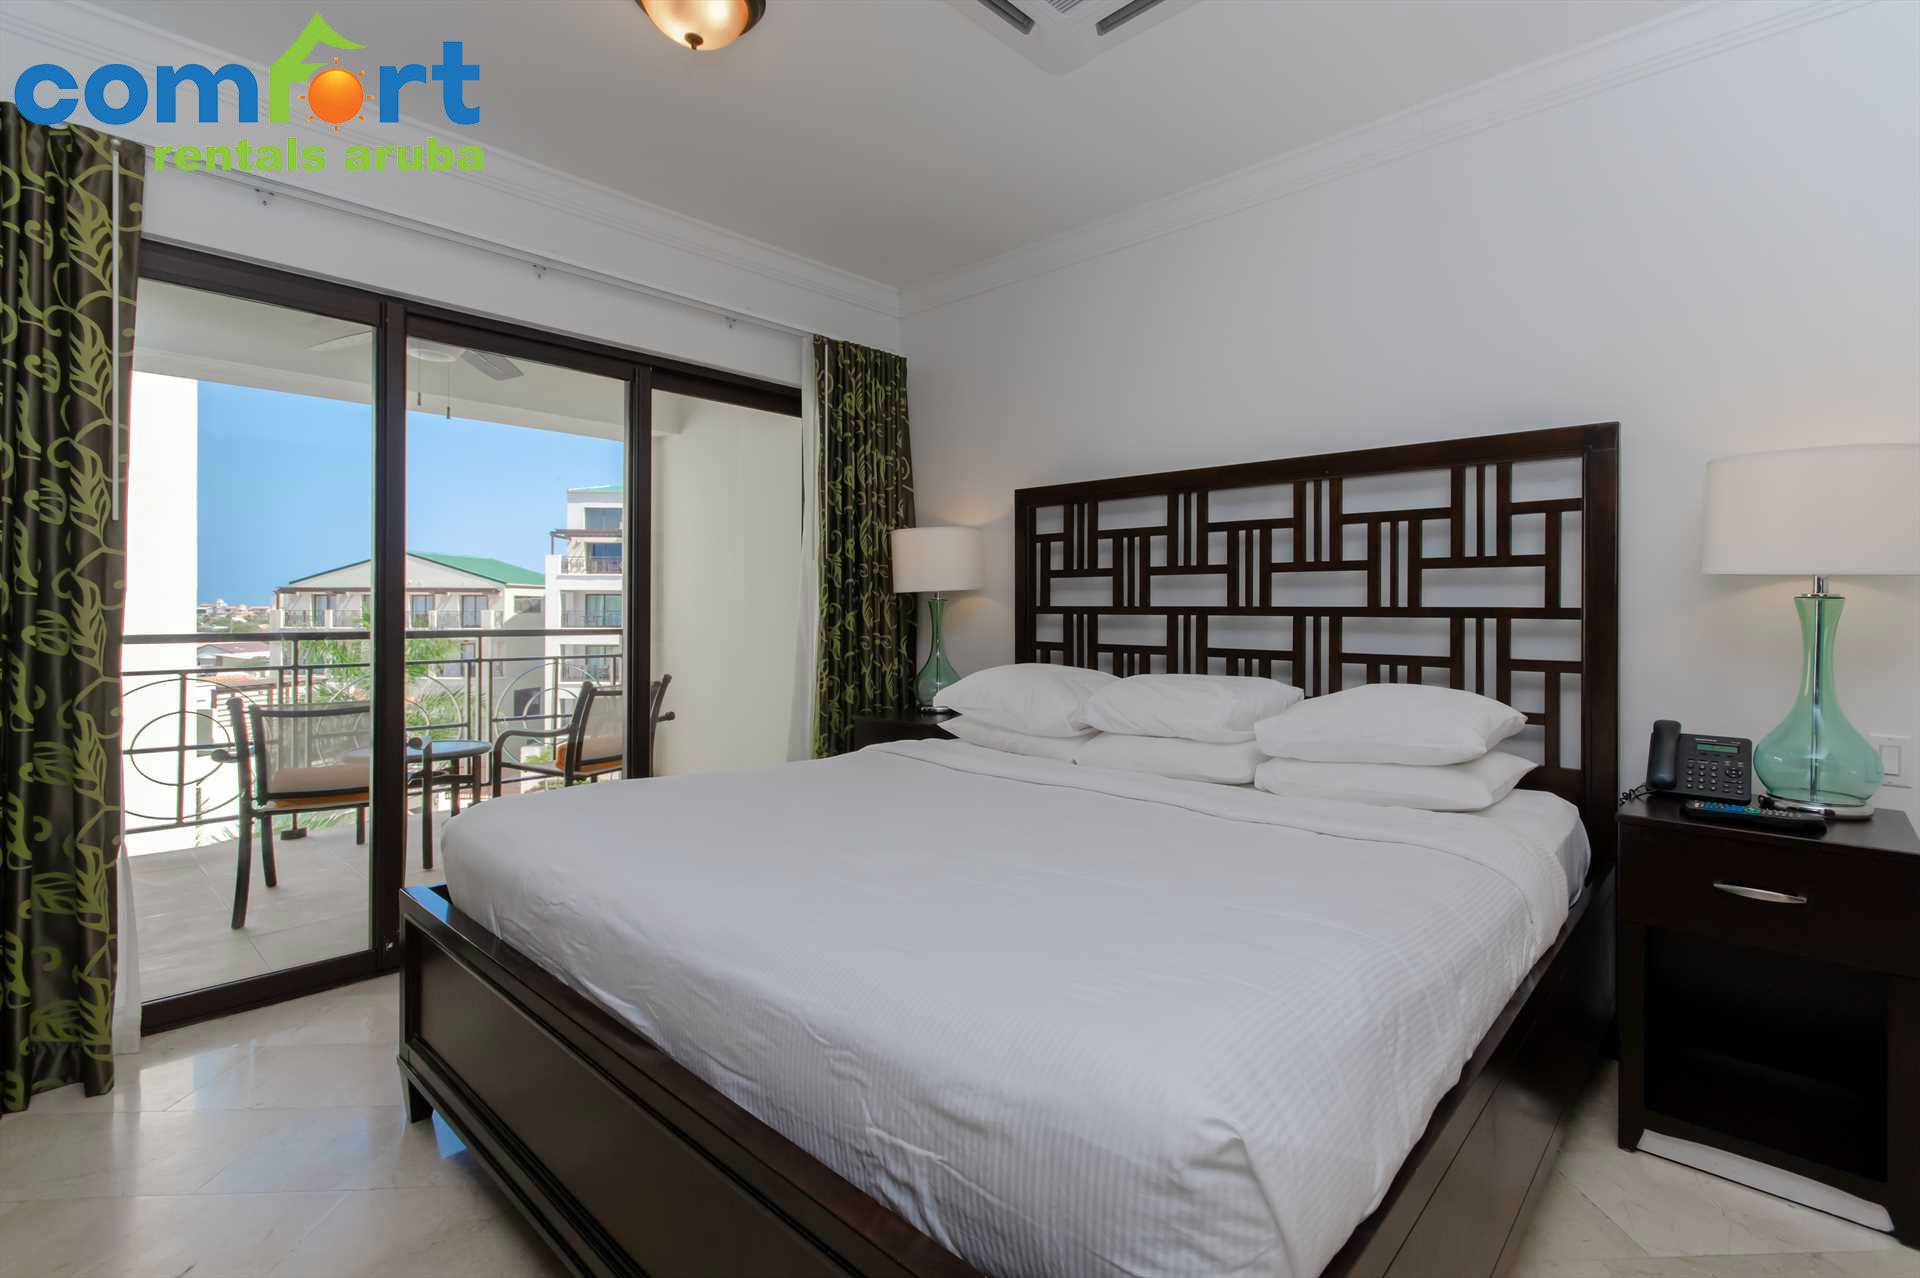 Wake up to paradise at the Banana Palm One-bedroom condo